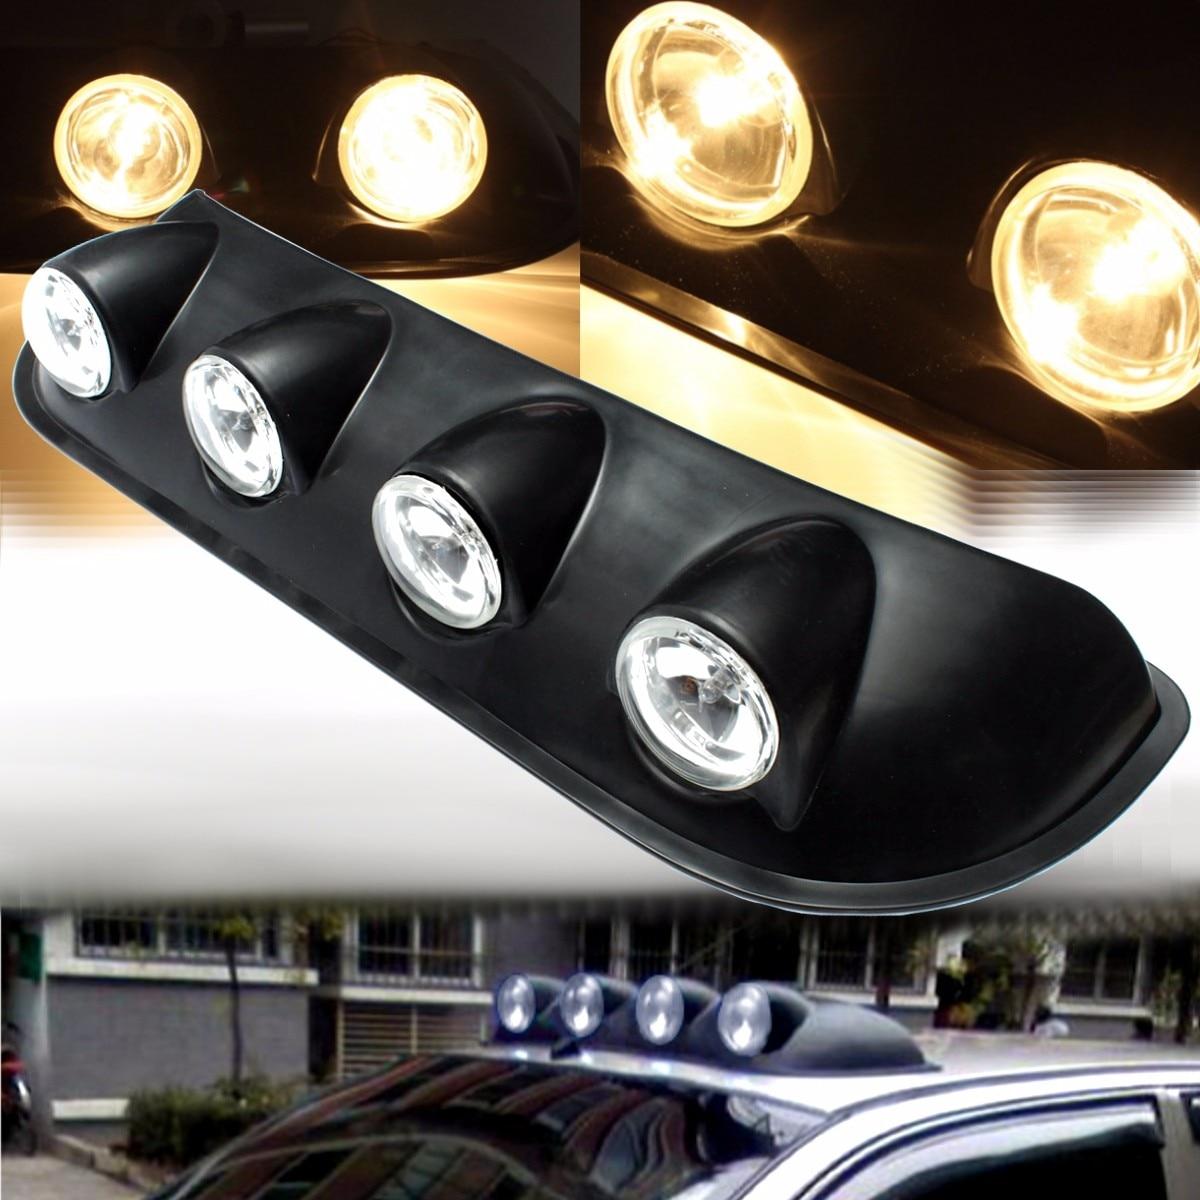 12V Amber Car Roof Marker Top Light Bar Warning Lamp For Pickup 4X4 Off Road SUV Truck VAN 55W Car Roof Light H3 Bulbs цена